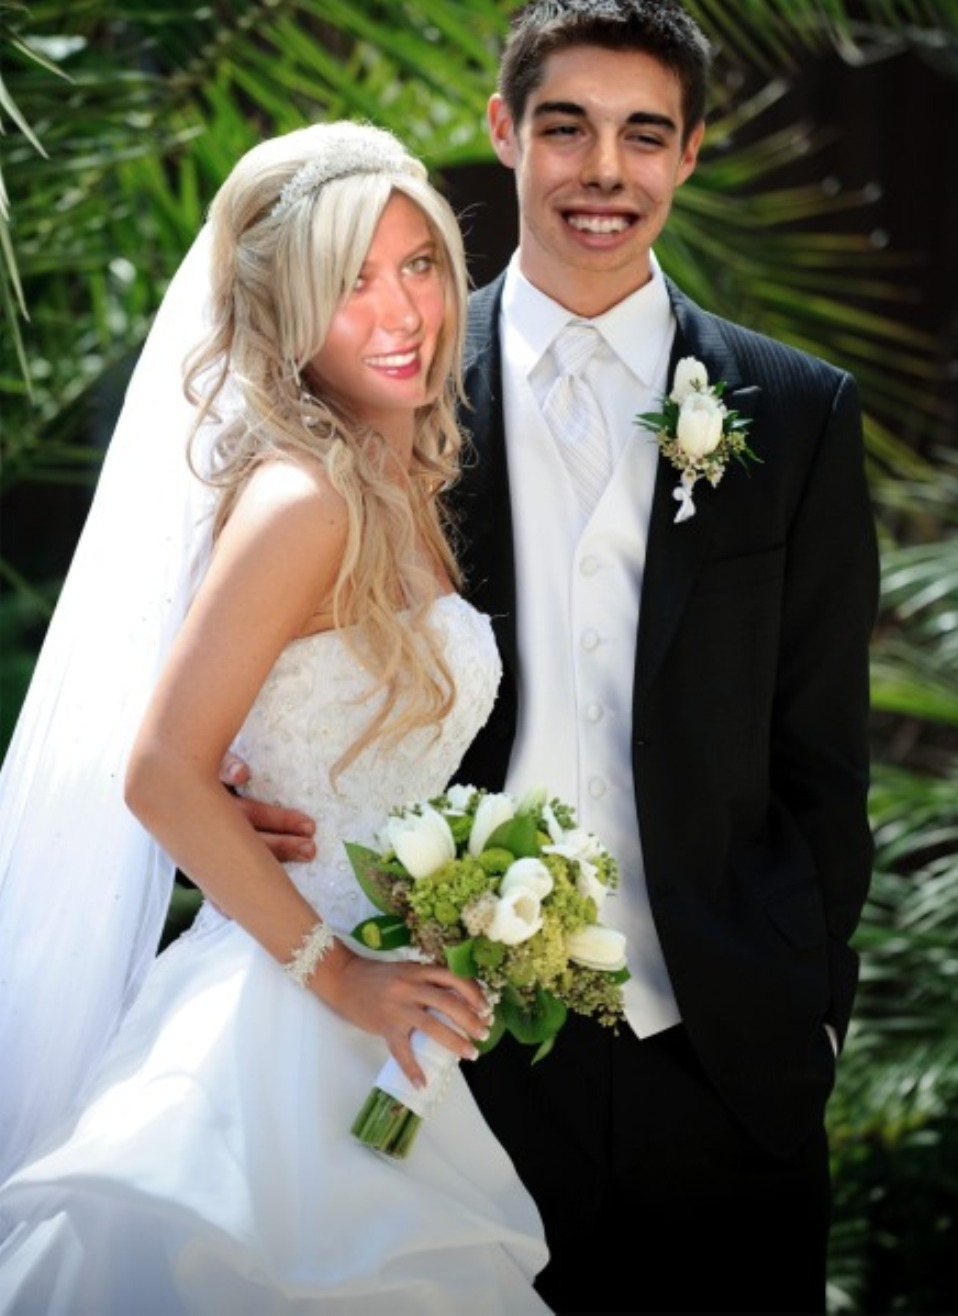 Sharapova and Vujacic wedding